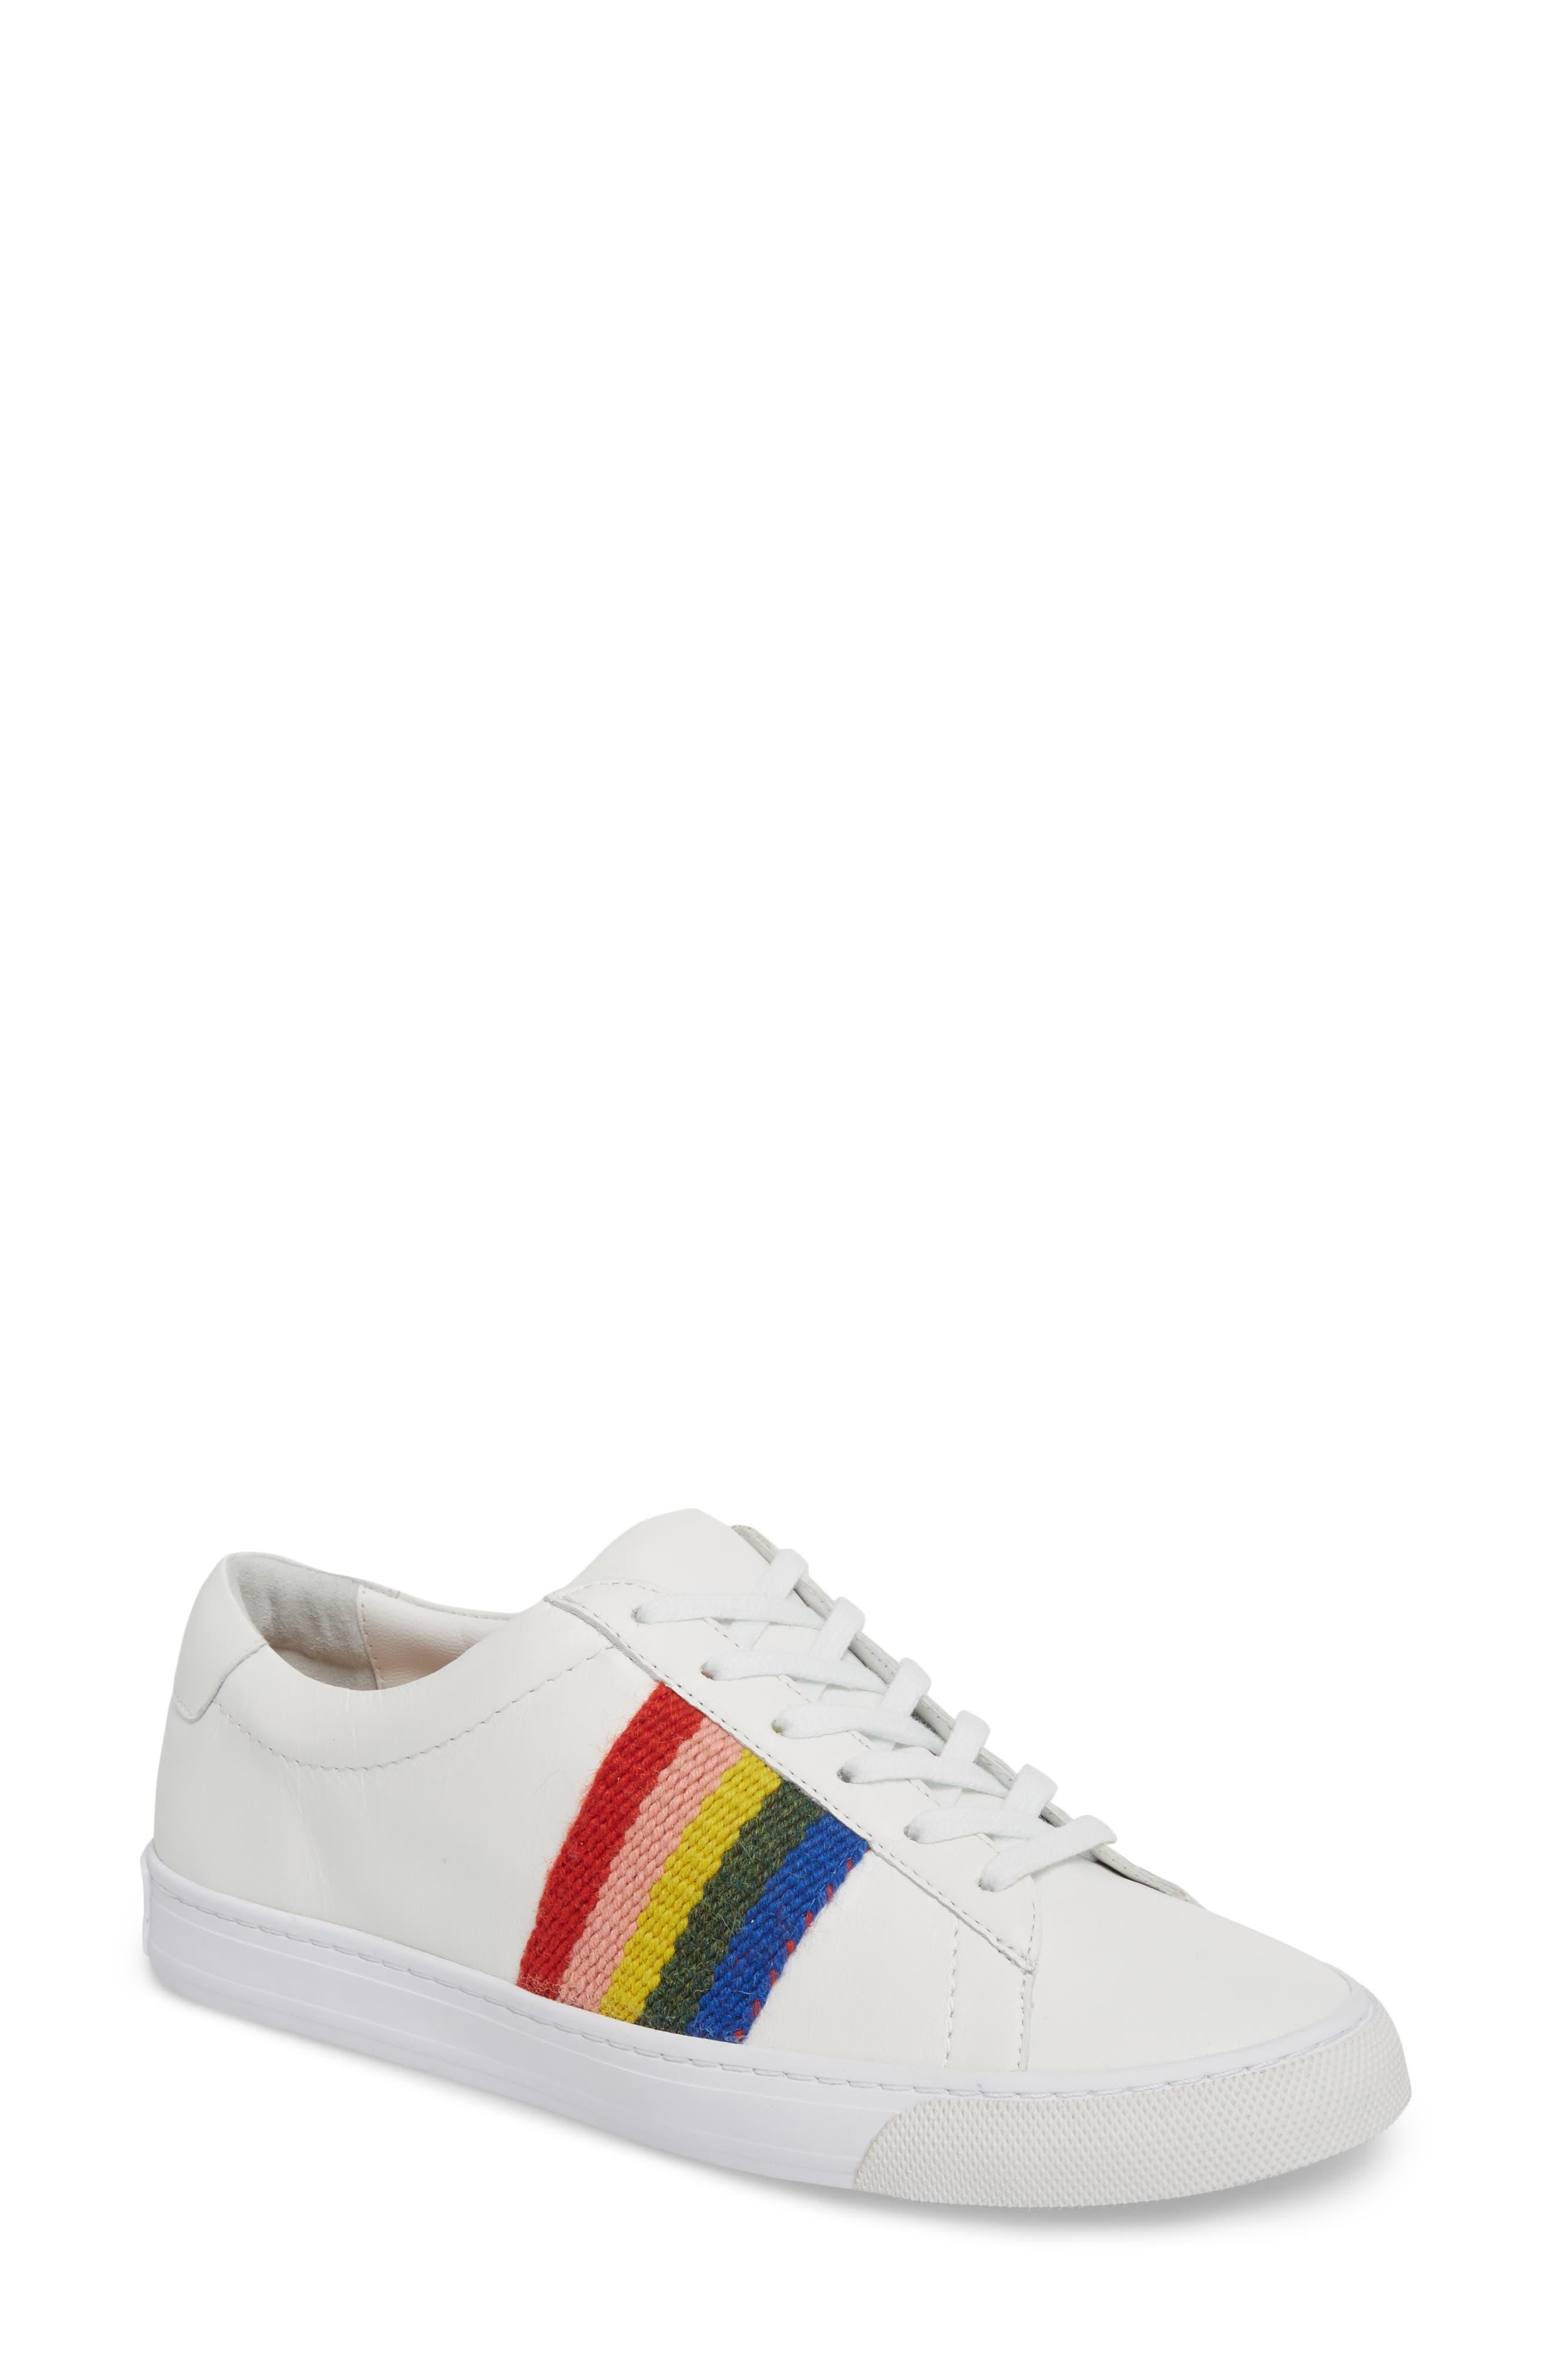 Logan Rainbow Sneaker,                             Main thumbnail 1, color,                             WHITE/ RAINBOW